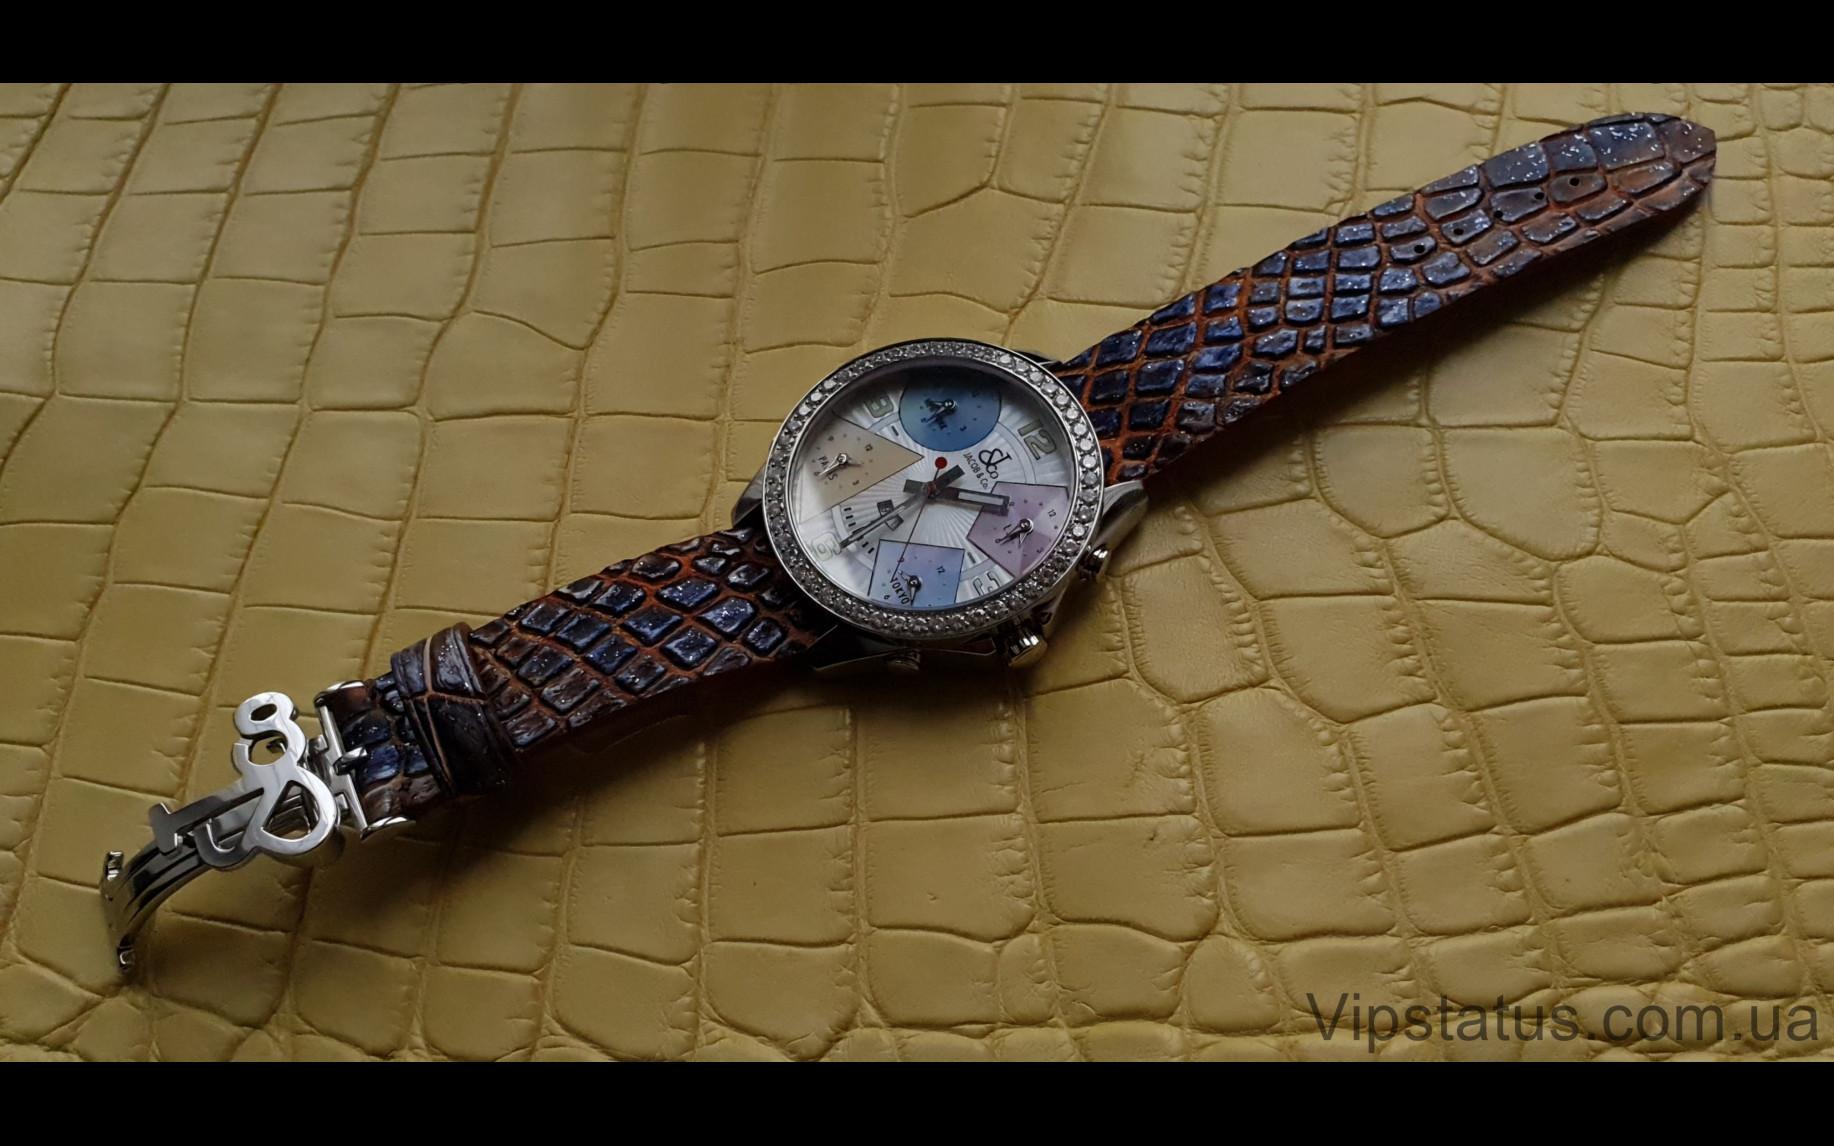 Elite Премиум ремешок для часов Jacob&Co кожа крокодила Premium Crocodile Strap for Jacob&Co watches image 3